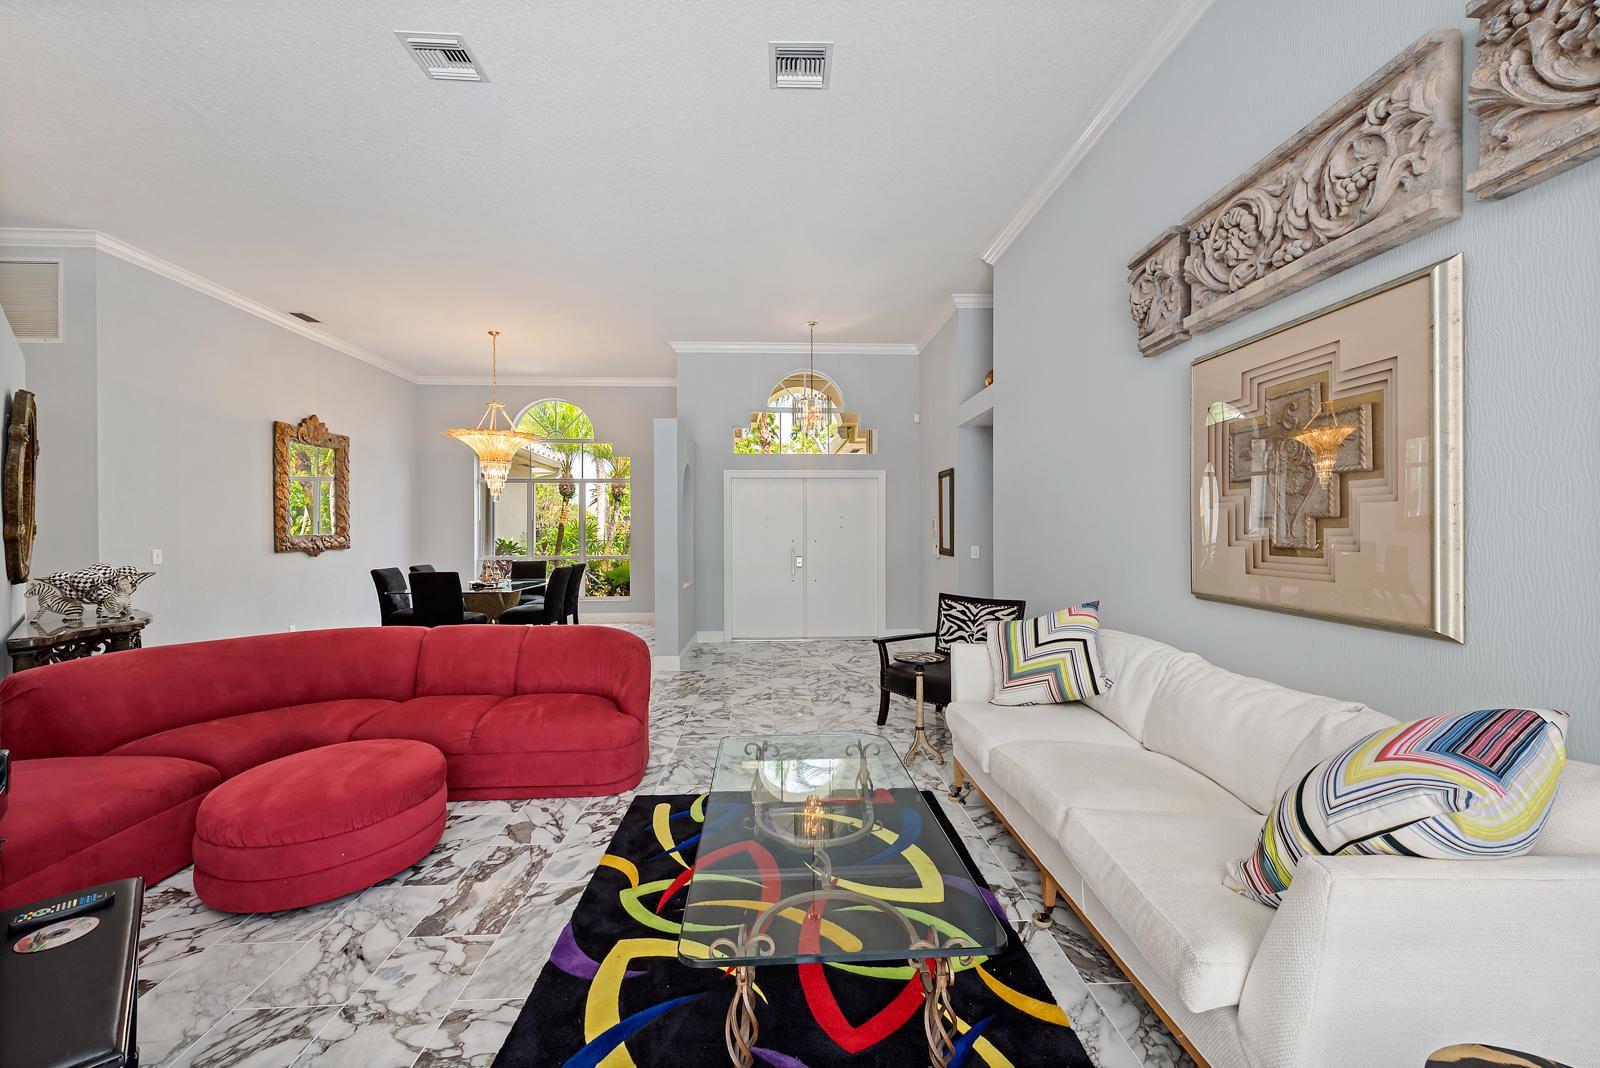 Photo of 30 Cayman Place, Palm Beach Gardens, FL 33418 (MLS # RX-10649942)